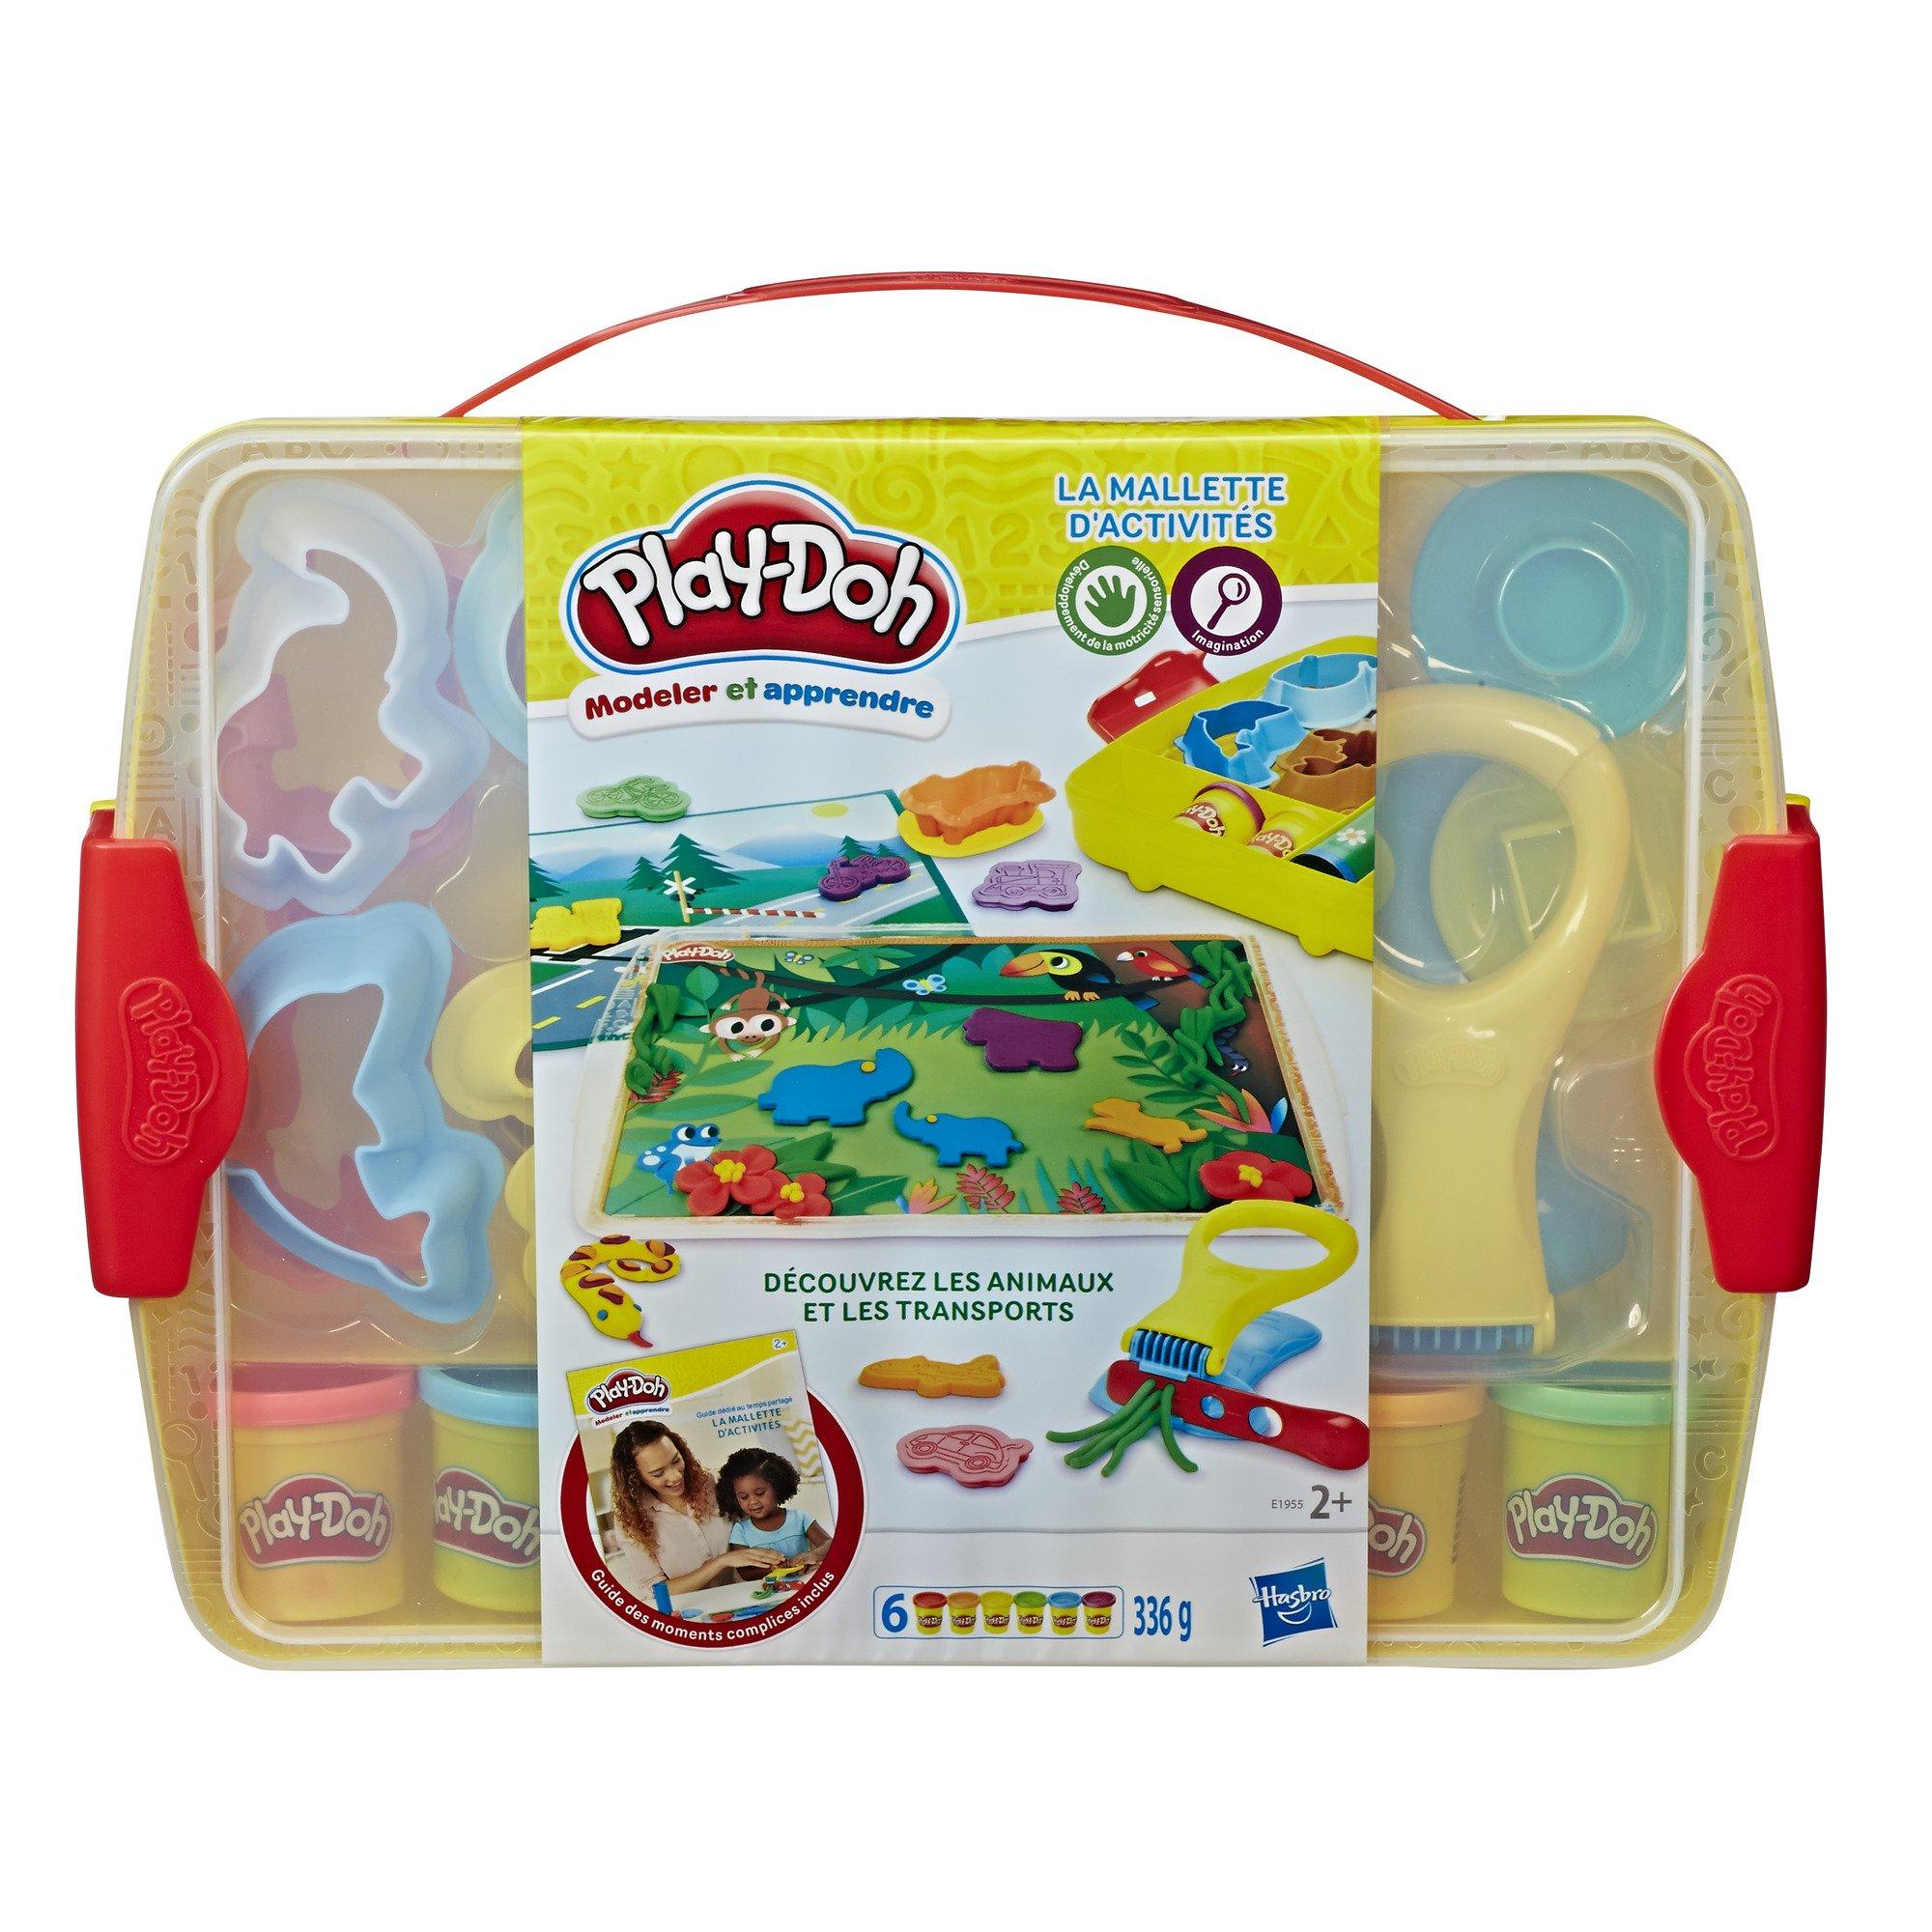 Play-Doh Pâte à Modeler, E1955, varié product image